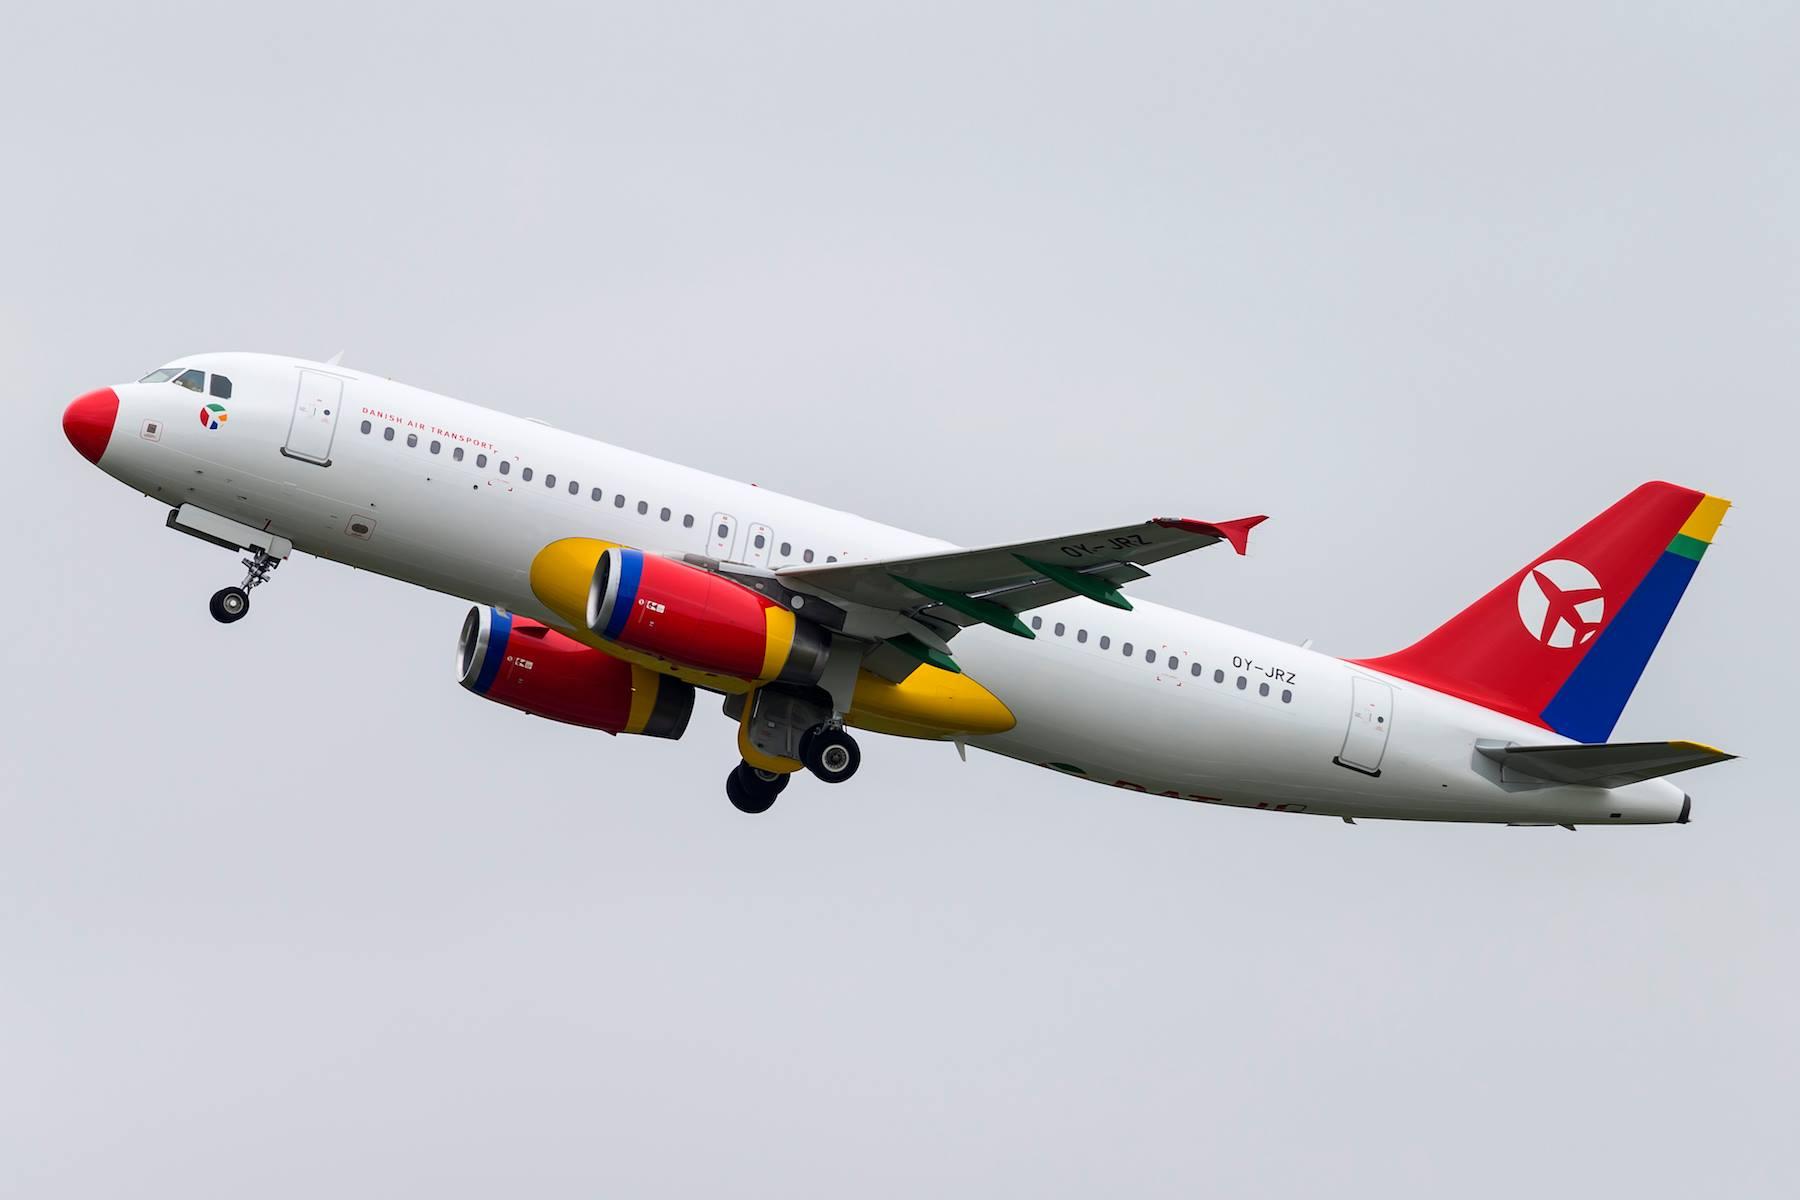 DAT A320-200 med registreringen OY-JRZ.